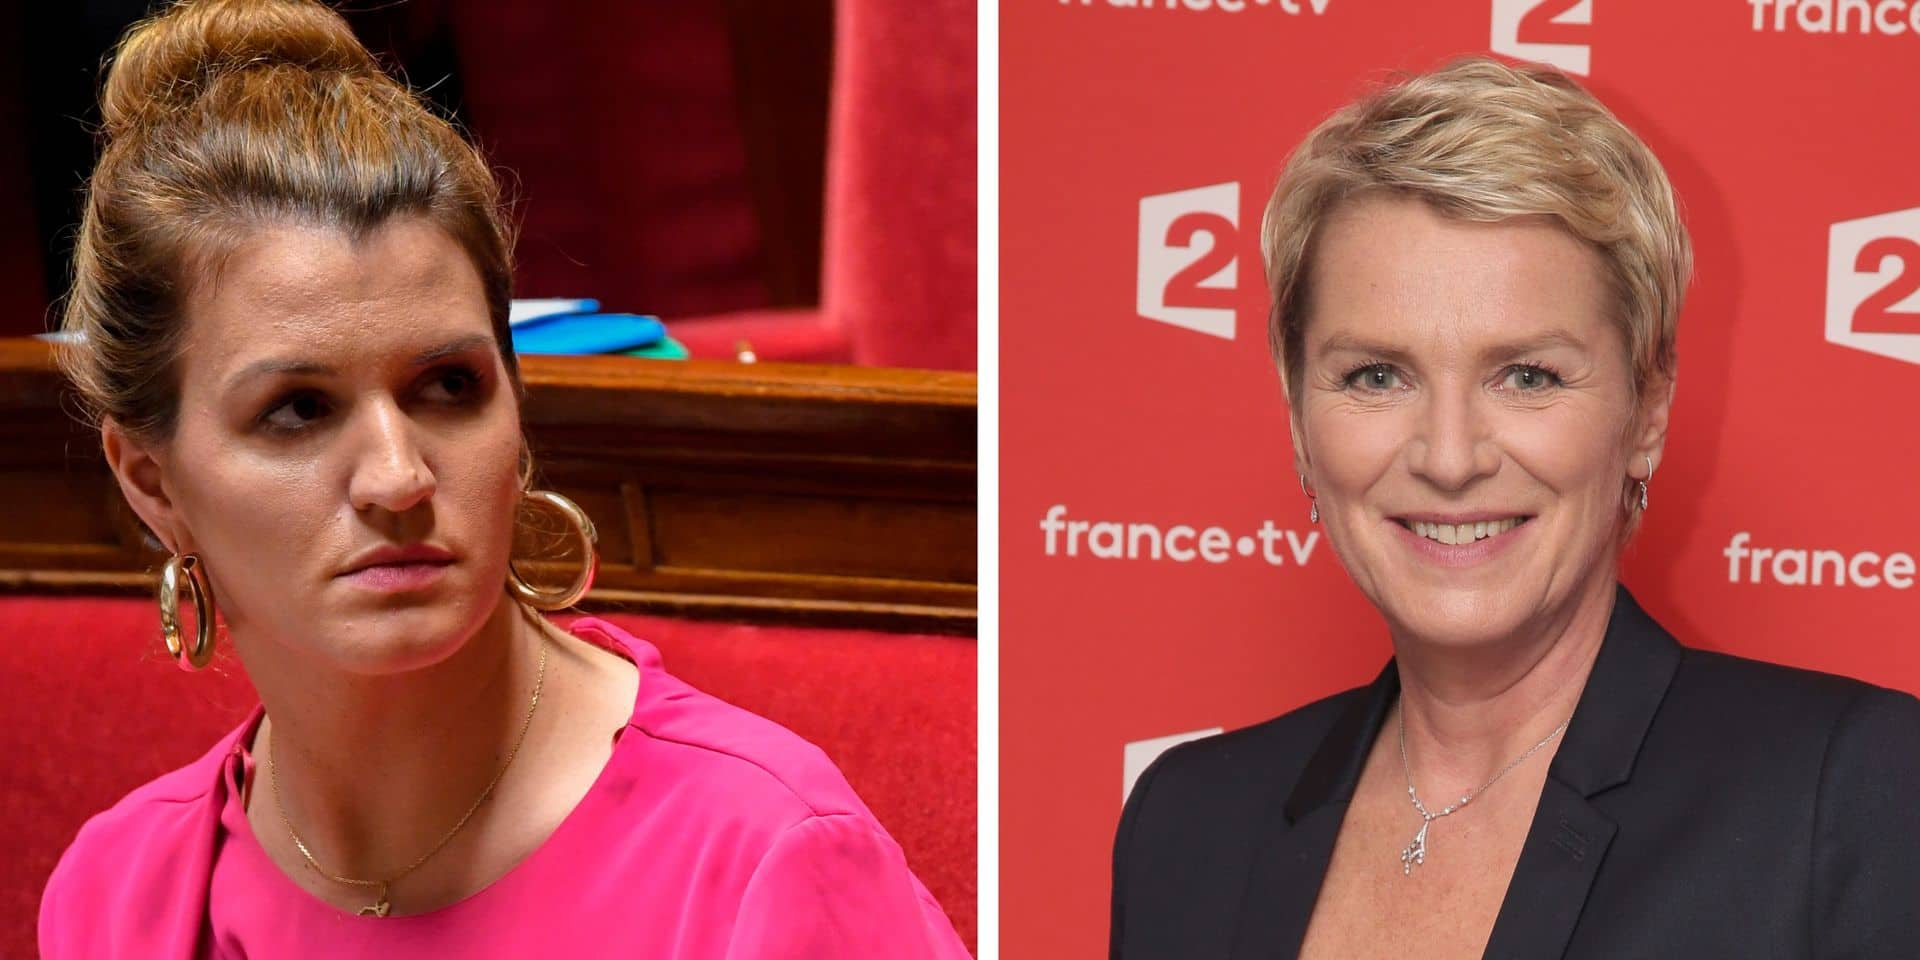 Marlène Schiappa vs Elise Lucet